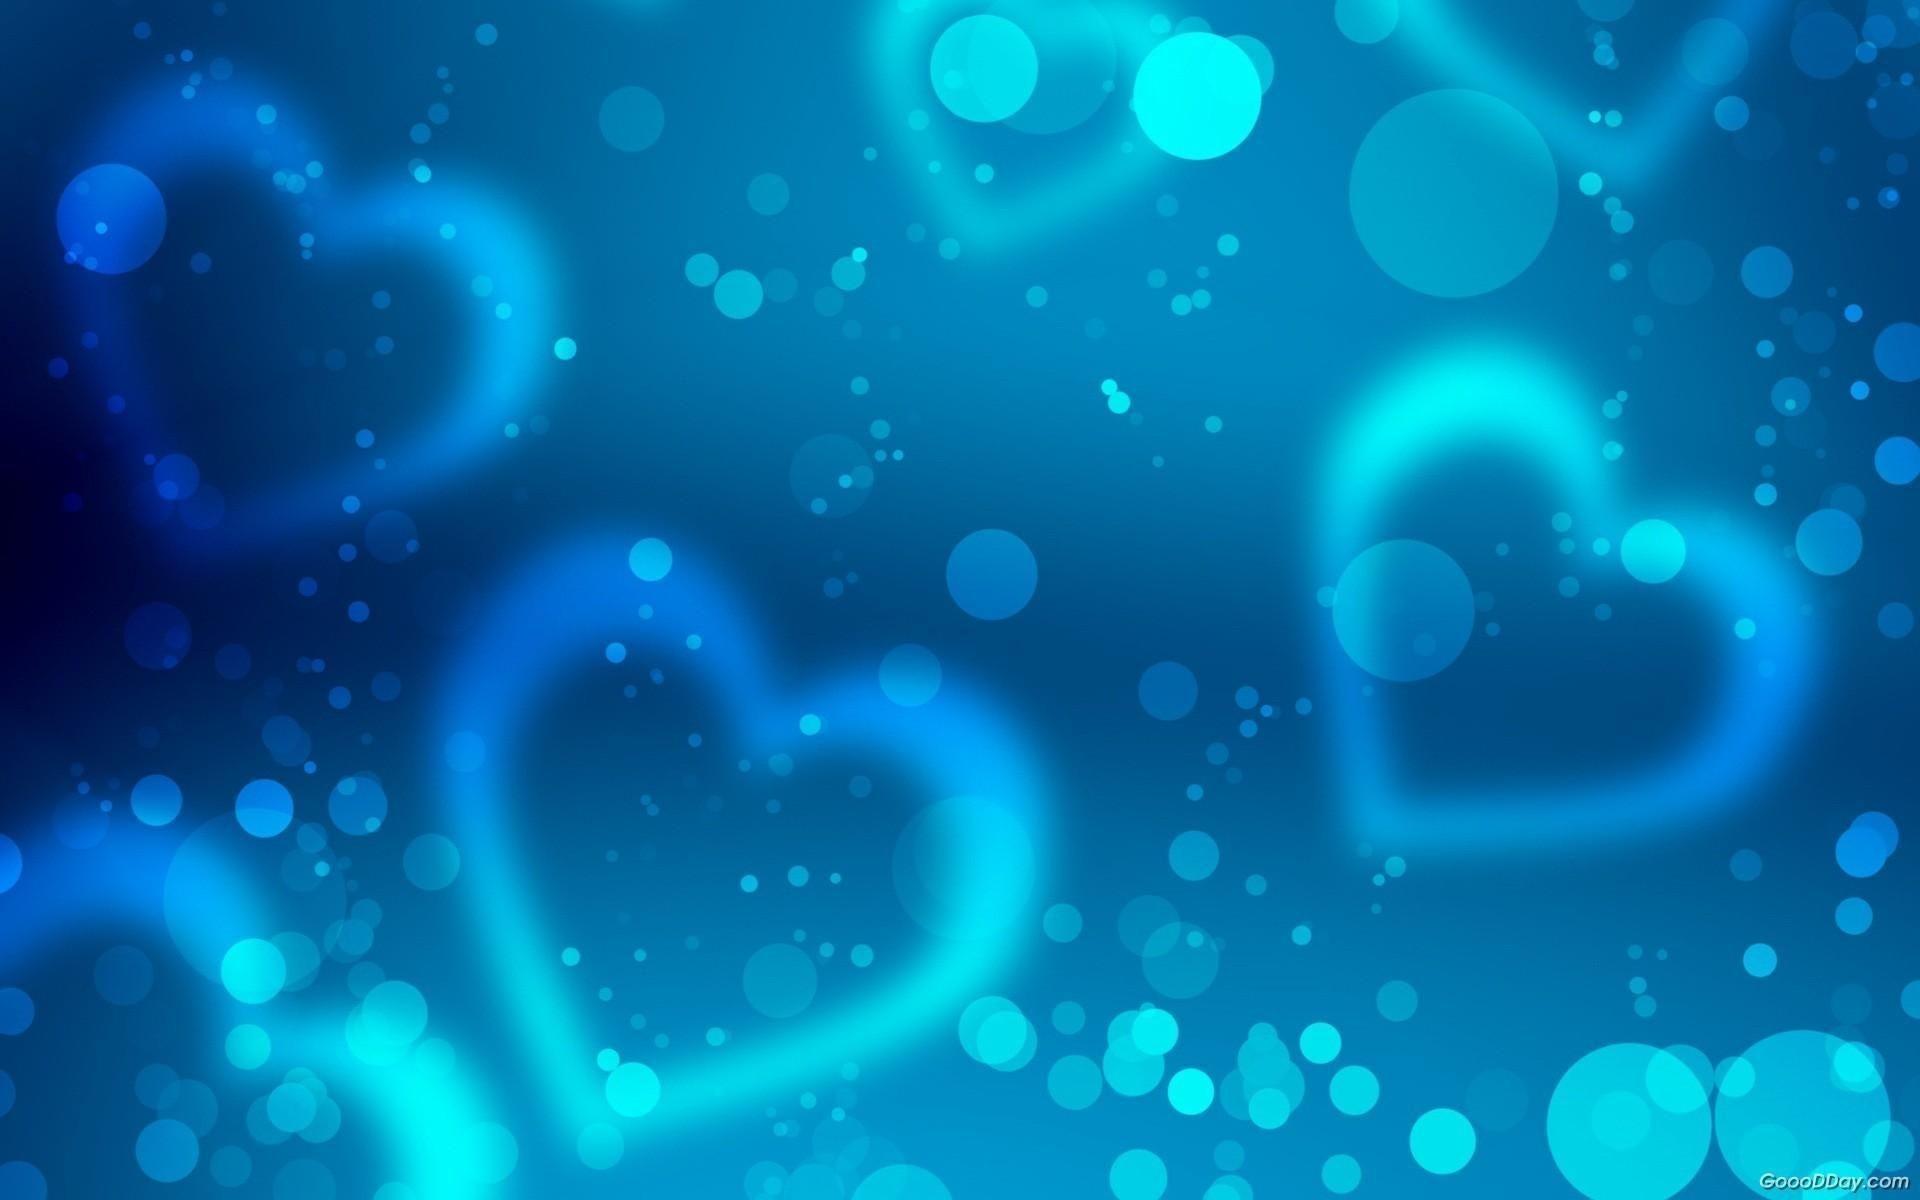 1920x1200, Cute Blue Heart Backgrounds 12494 Full Hd - Blue Heart Background Hd - HD Wallpaper